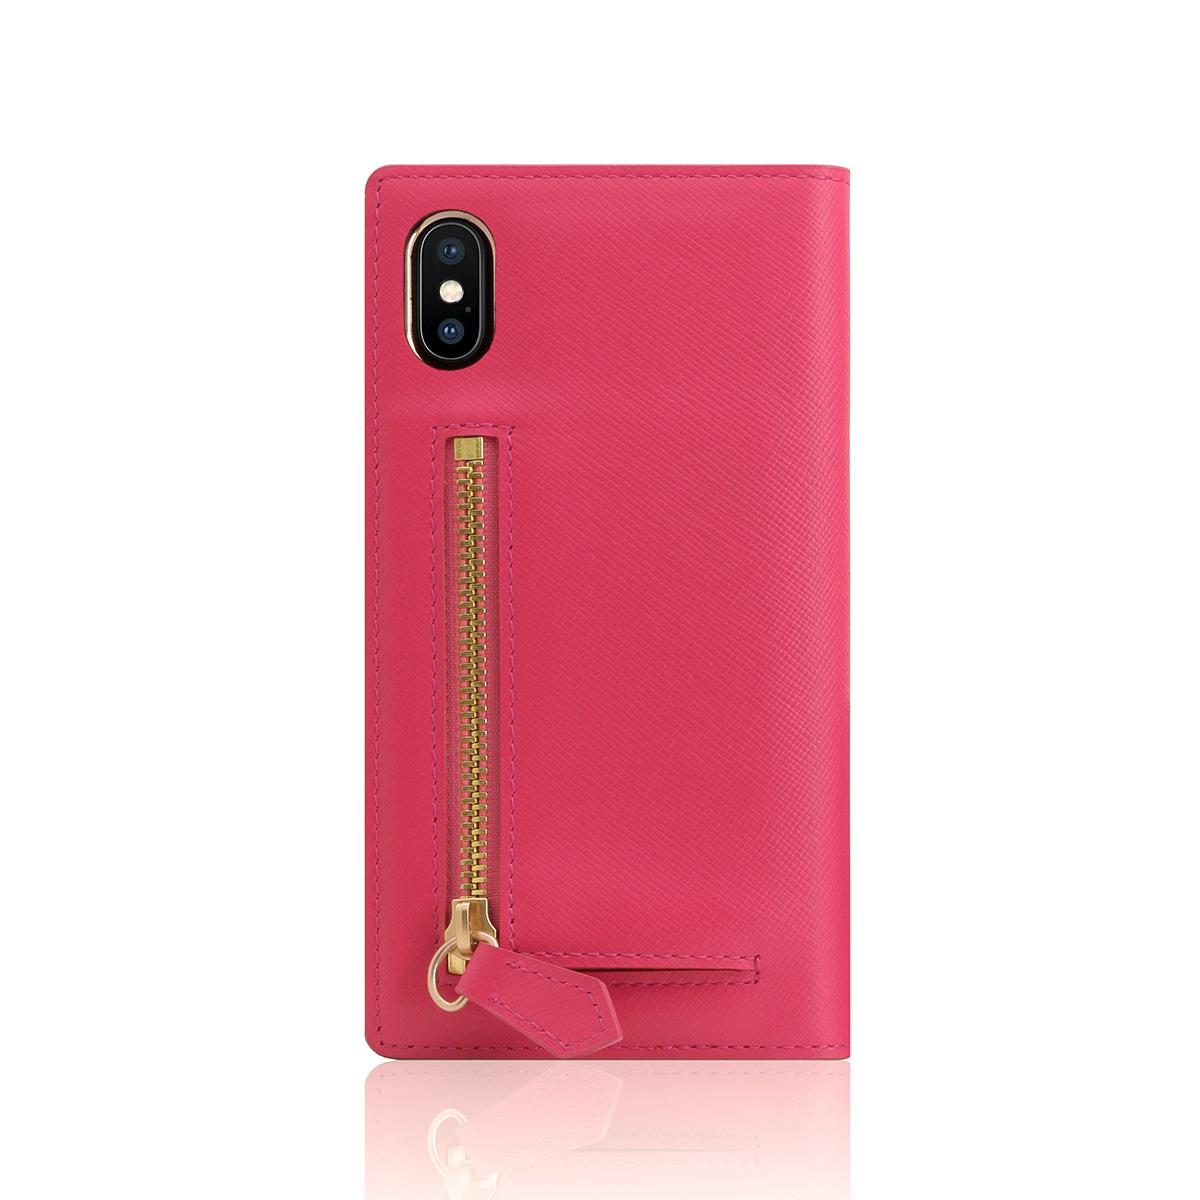 iPhone XS / X ケース SLG Design Saffiano Zipper Case 手帳型 本革(エスエルジー サフィアーノジッパーケース)アイフォン カバー レザー